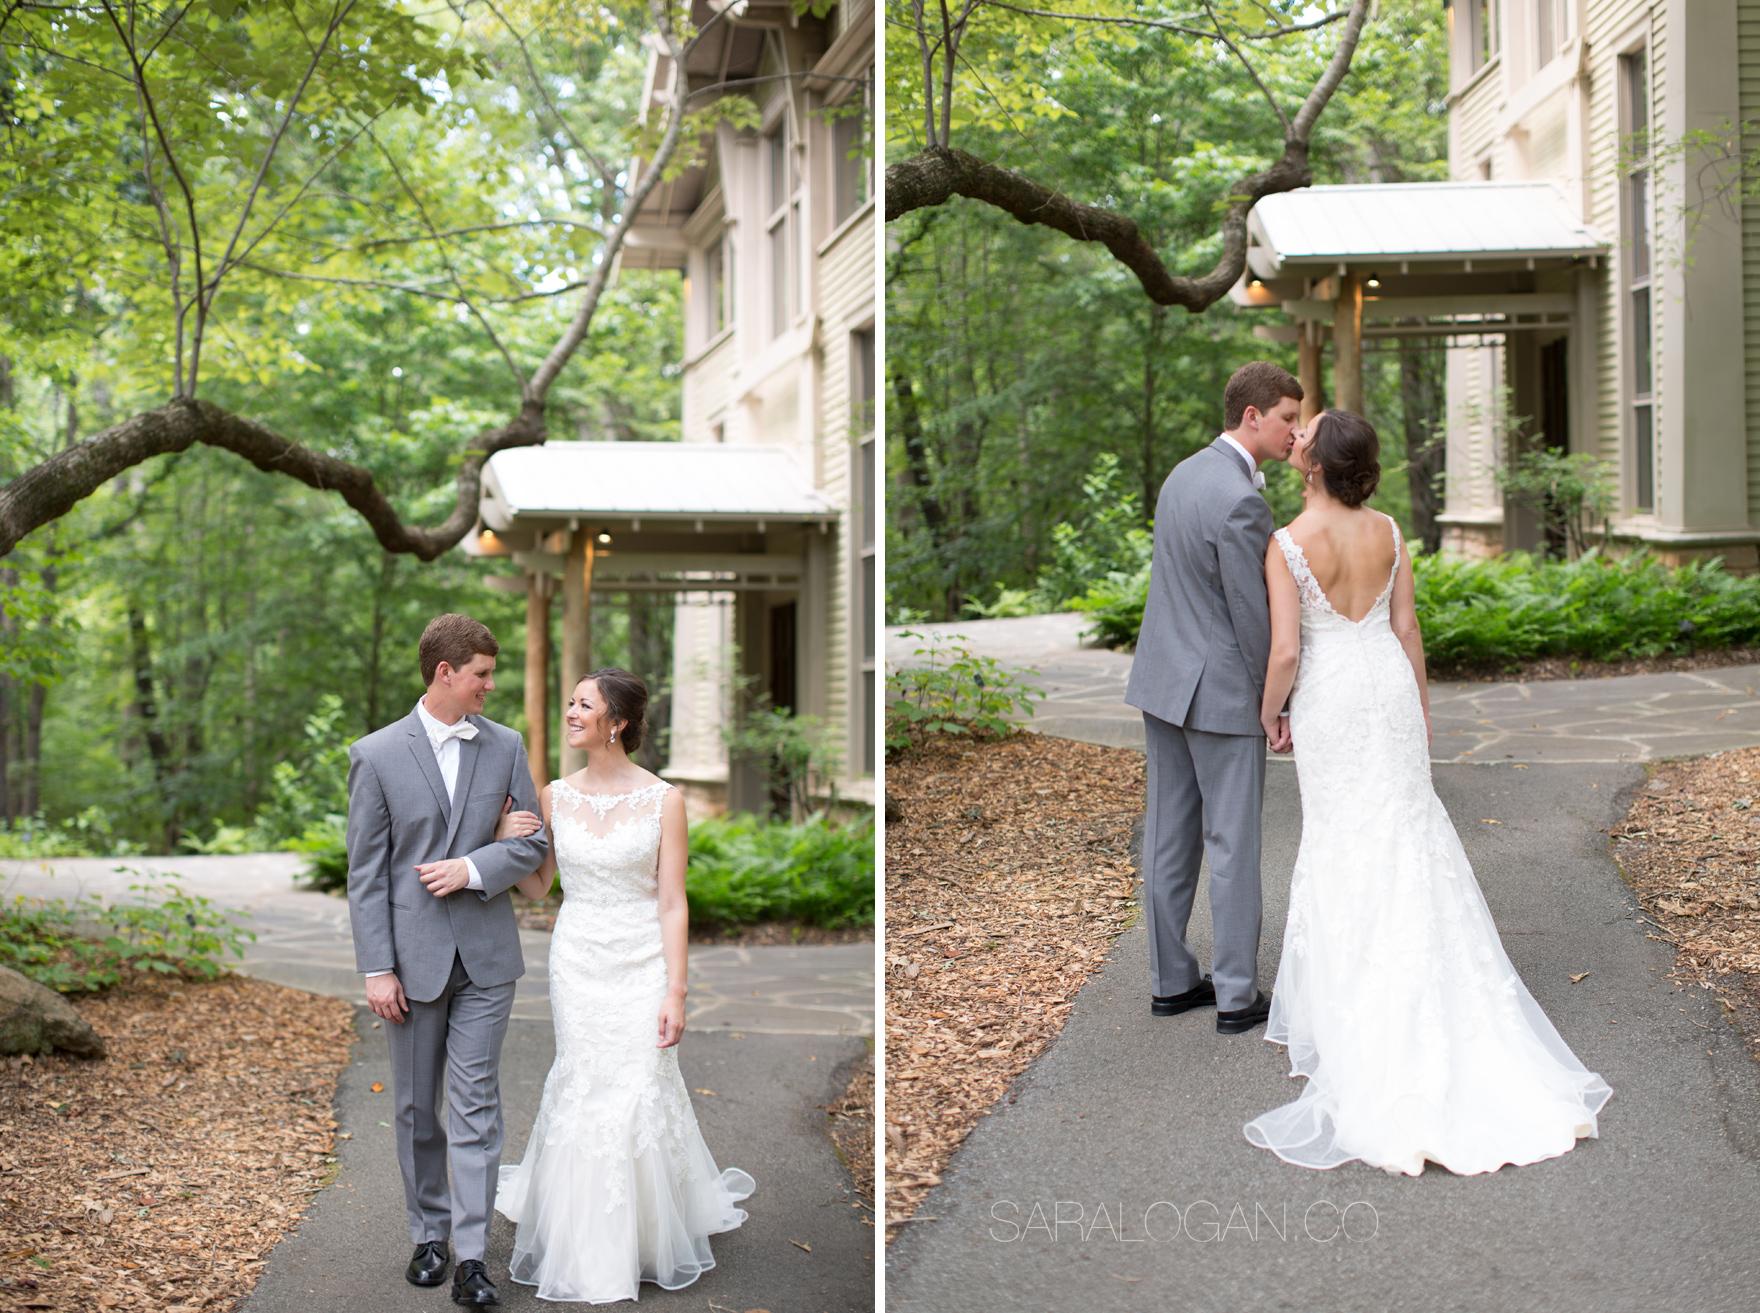 state botanical gardens wedding photos